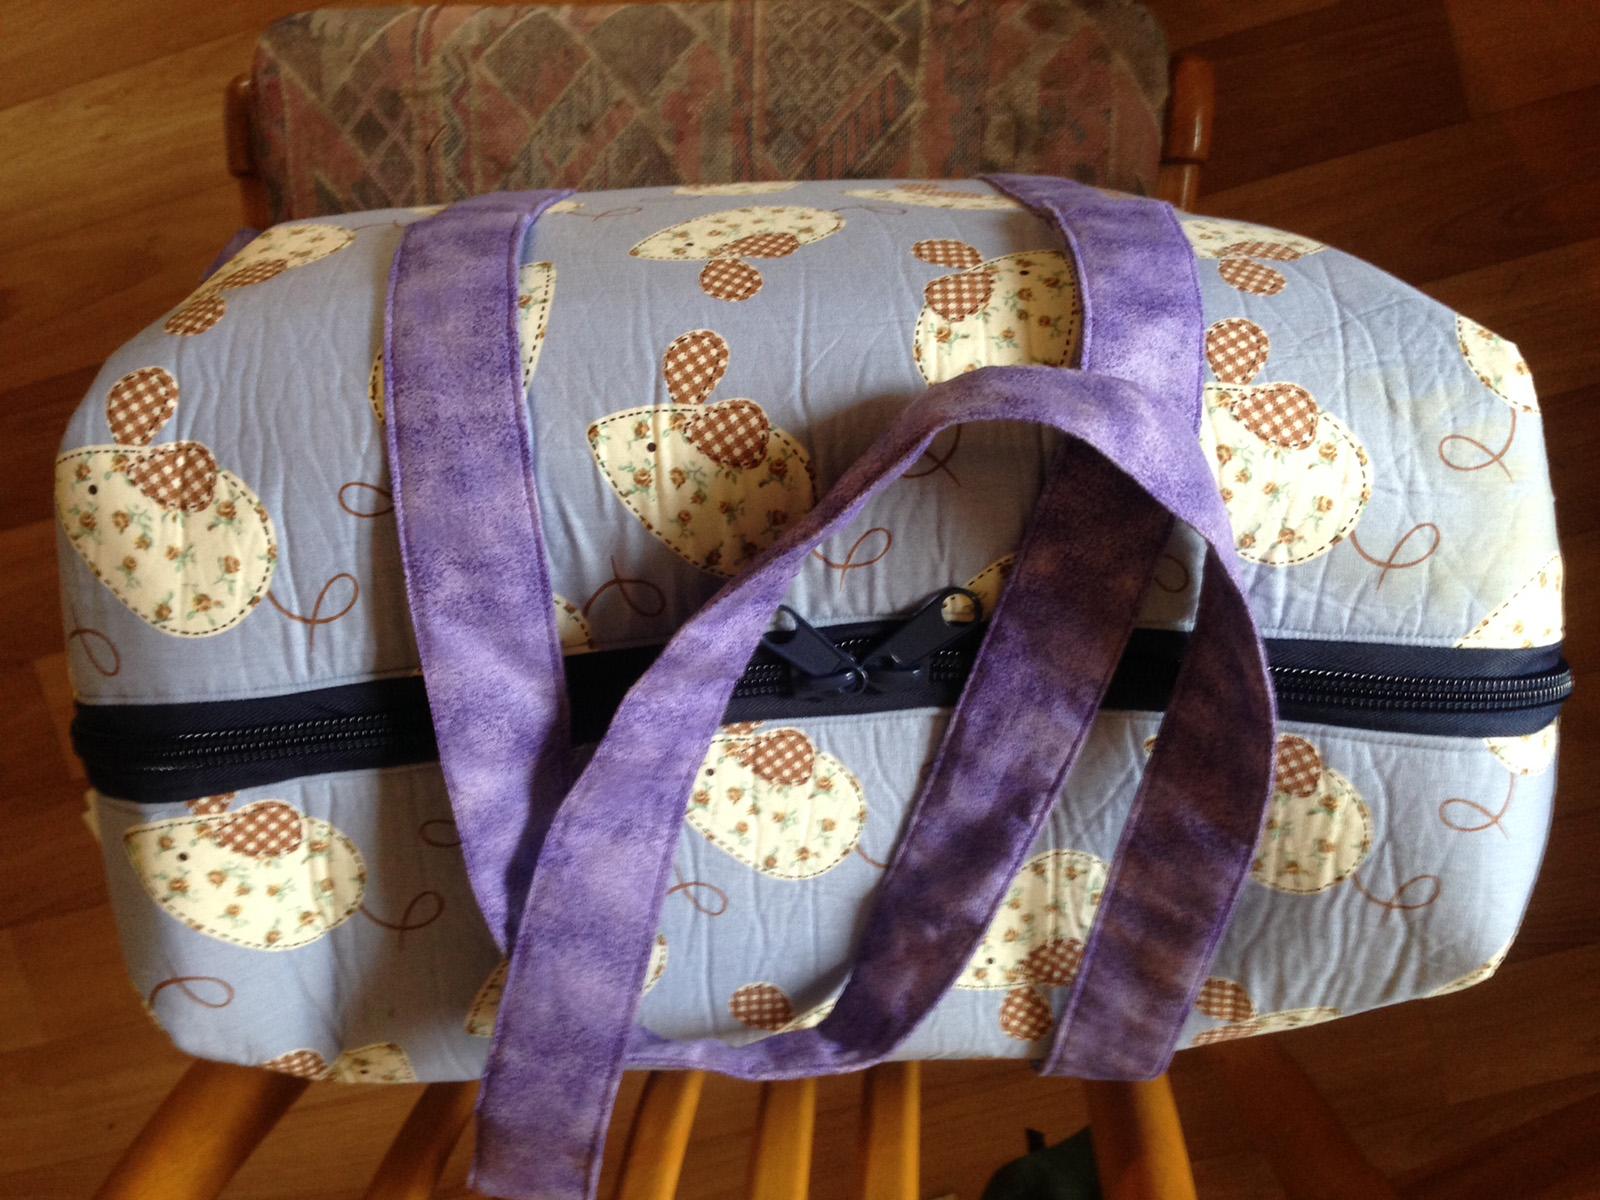 Sew Sweetness Emblem Duffle Bag, sewn by Mhairi